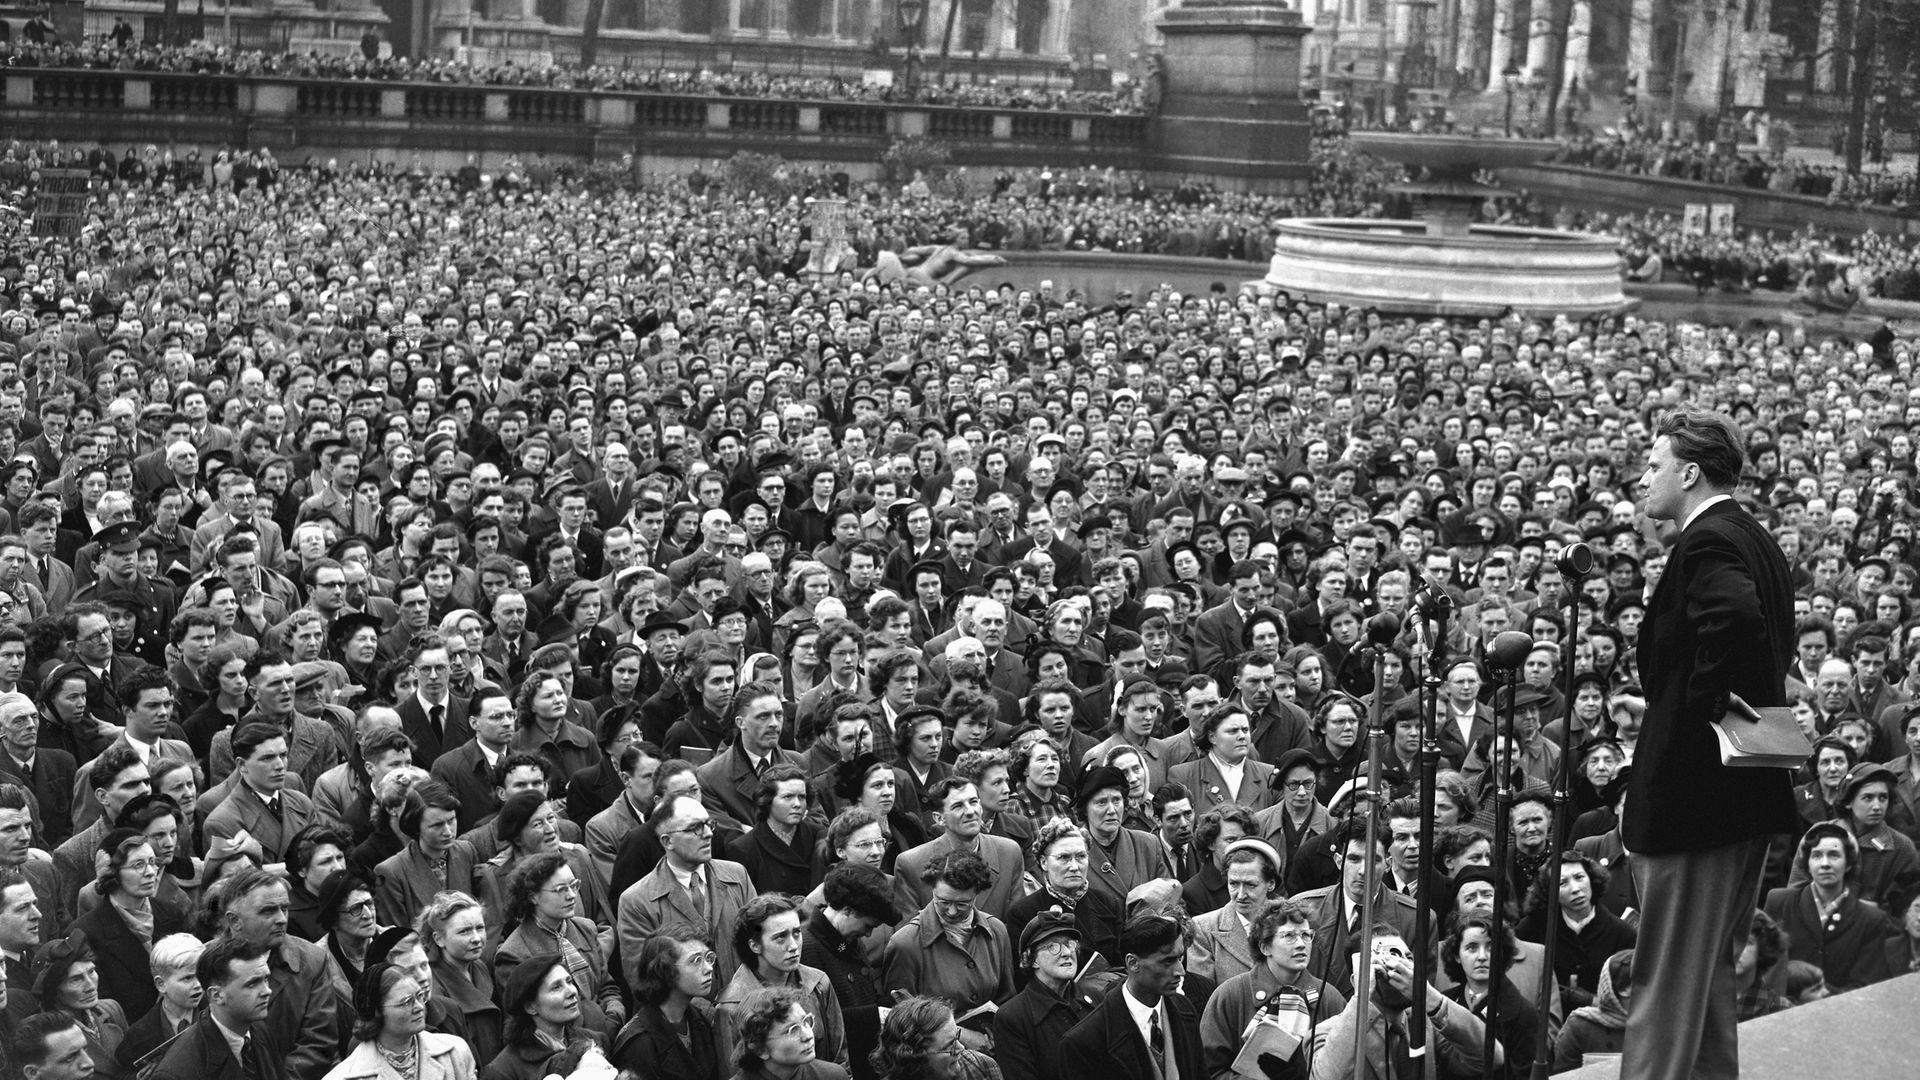 Bible in hand, American evangelist Billy Graham speaks to a crowd in Trafalgar Square in 1954 - Credit: Bettmann Archive